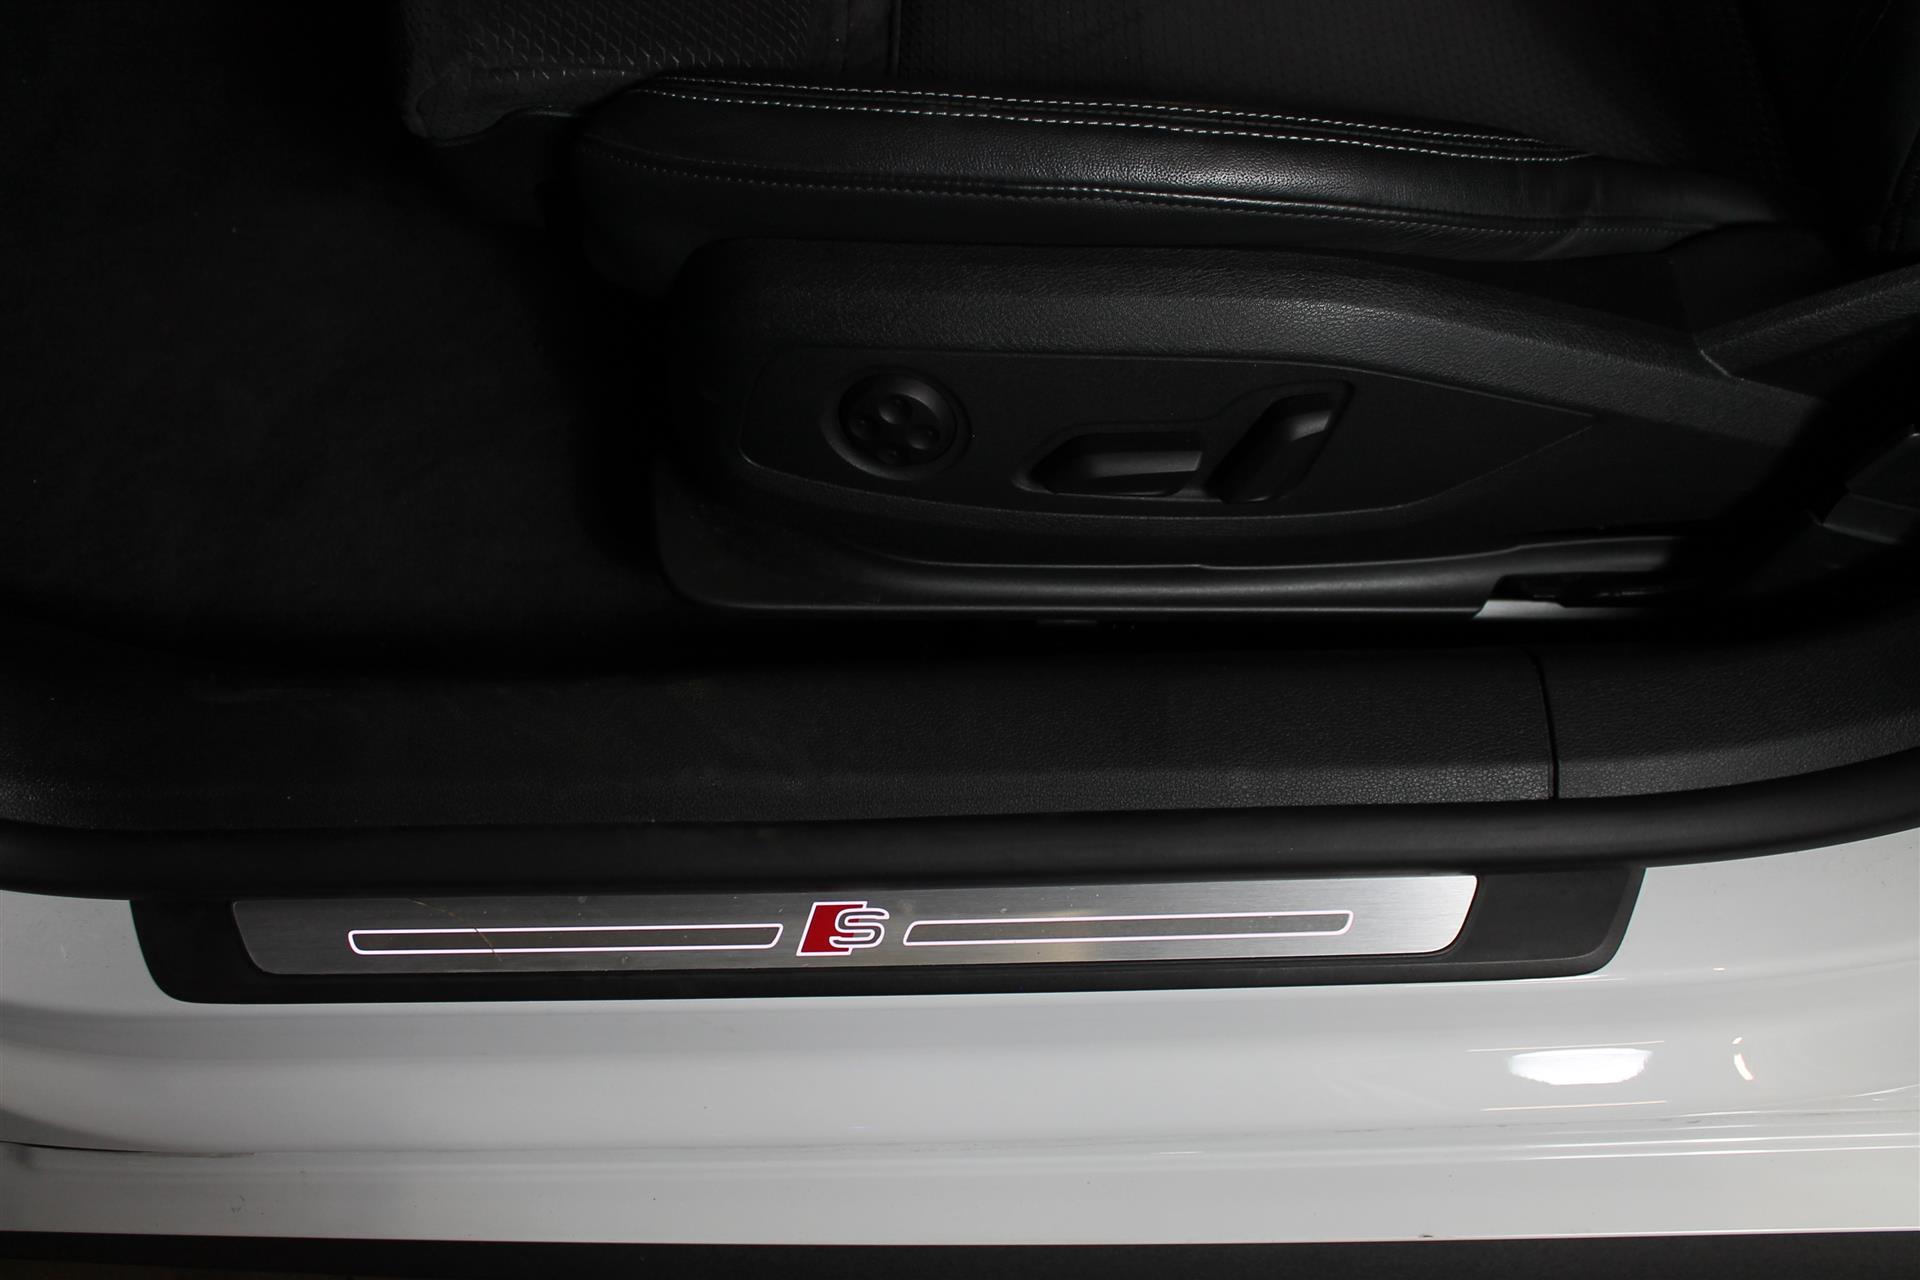 Sportback 3,0 TFSI Quattro Tiptr. 354HK 5d 8g Trinl. Gear image11